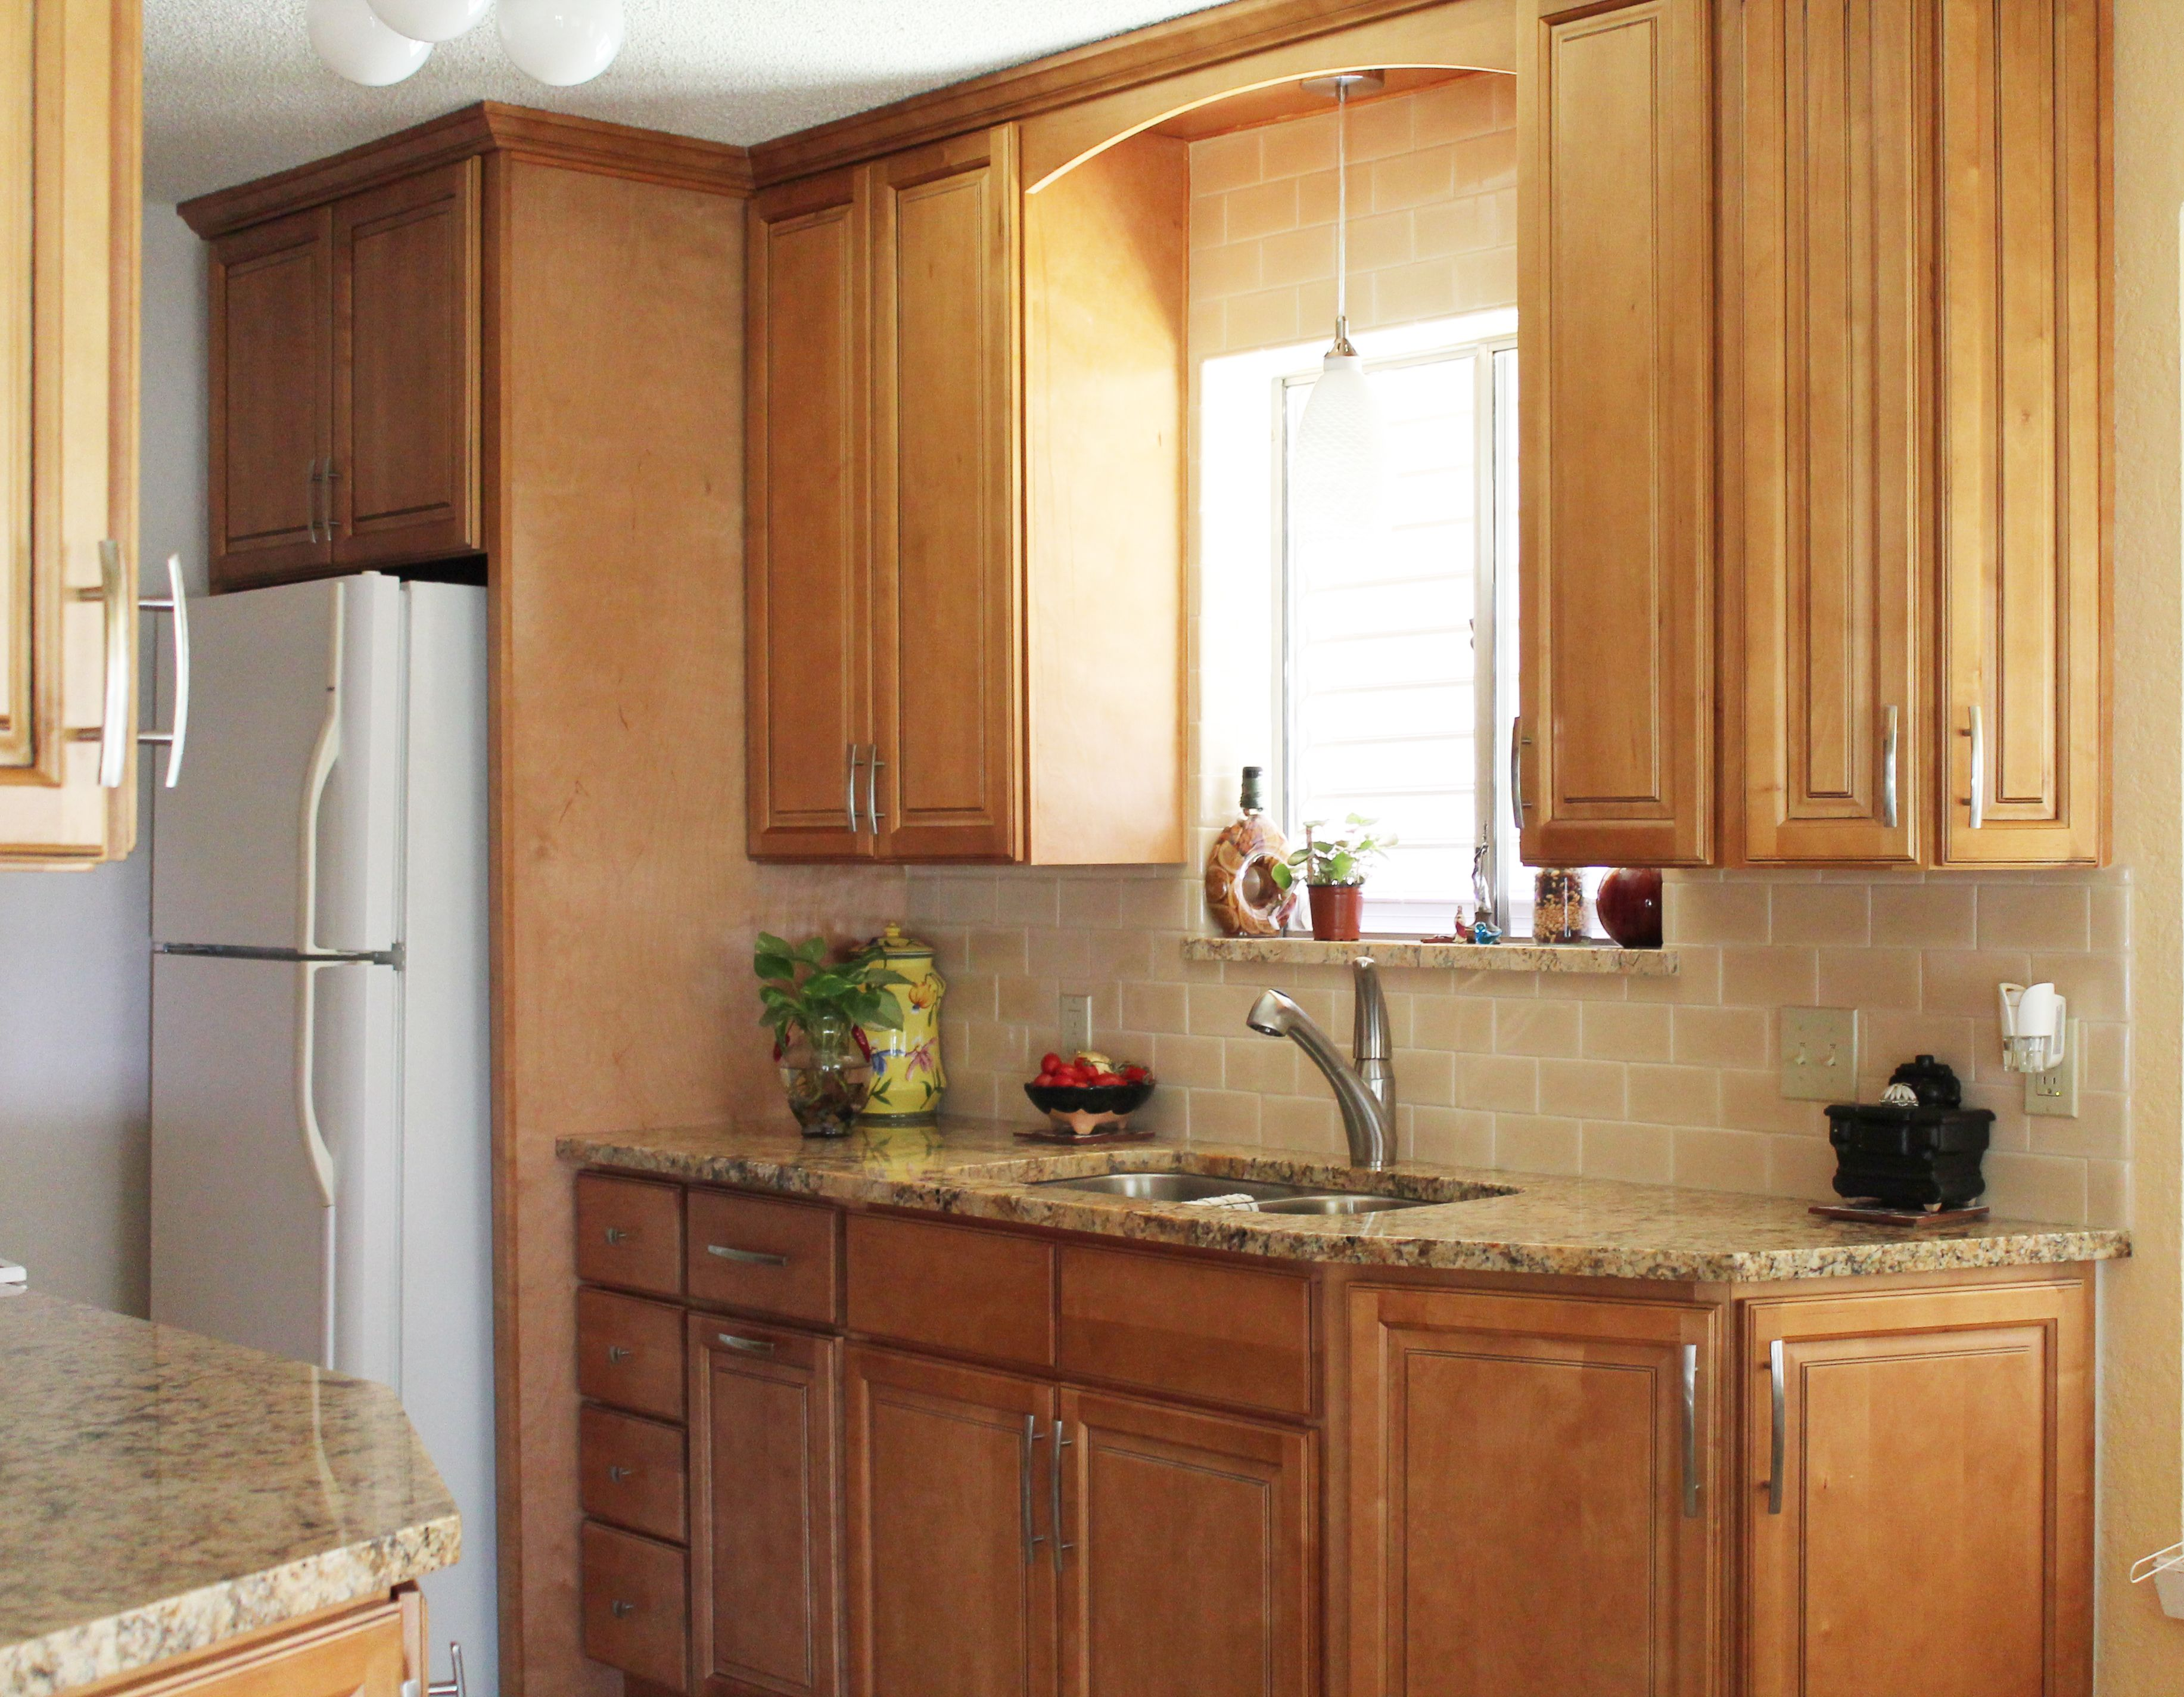 Warm Kitchen Design With Granite Countertops Peach Subway Tile Backsplash And Russian Kitchen Cabinets And Countertops Honey Oak Cabinets Lake House Kitchen